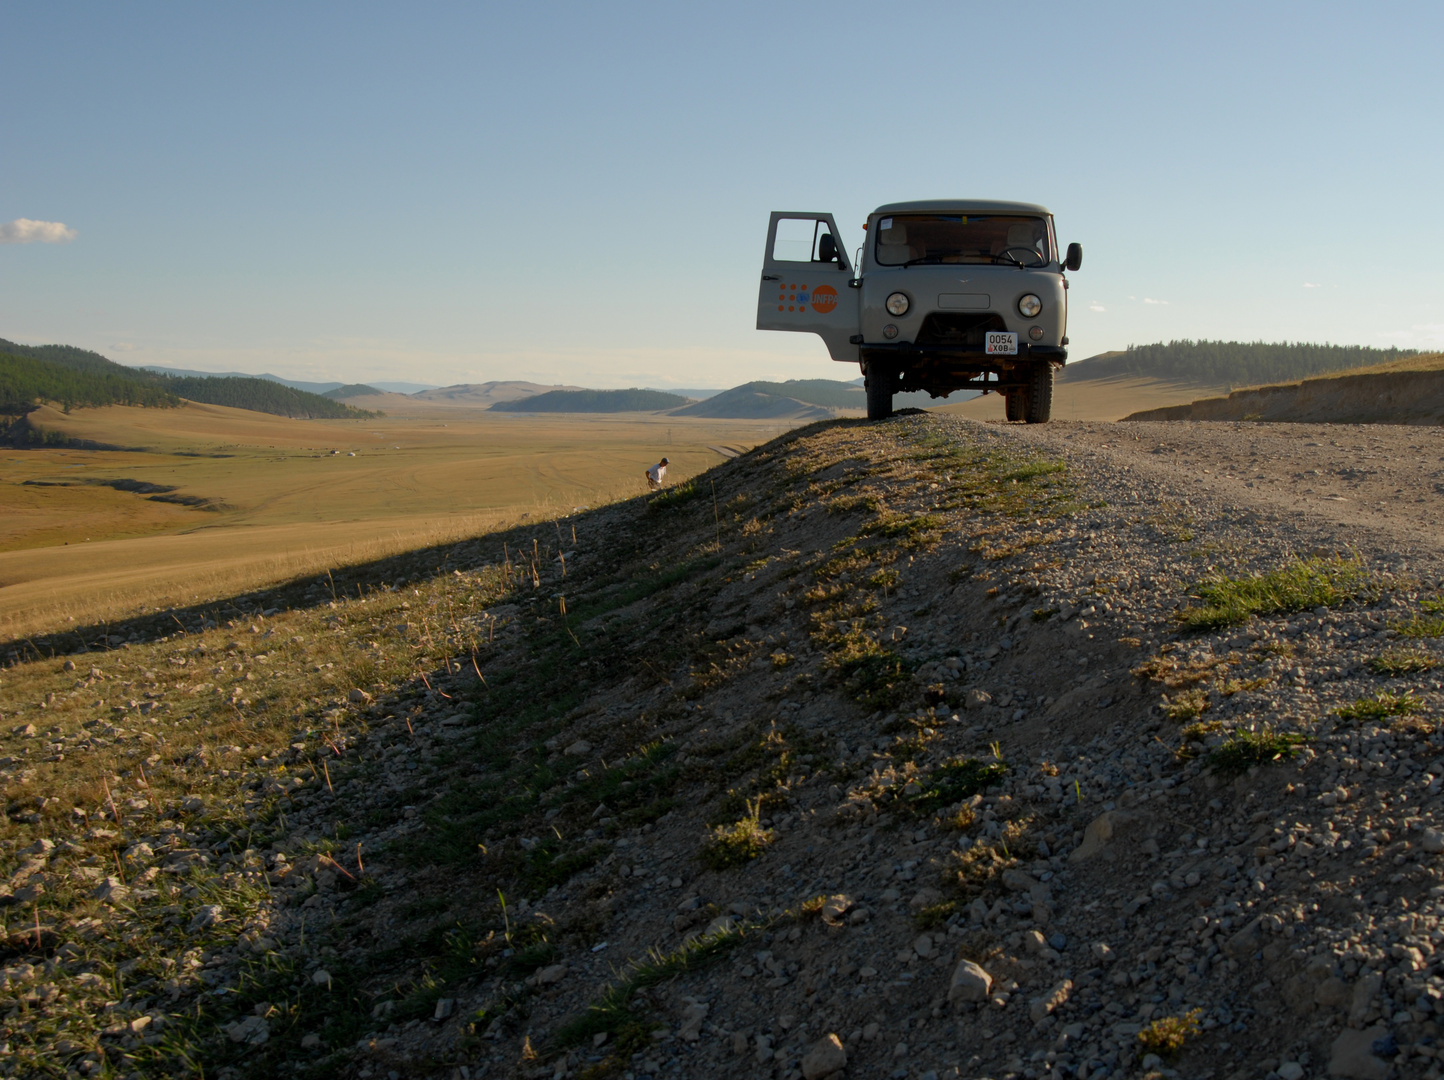 Fahrt zum Khövsgöl-See